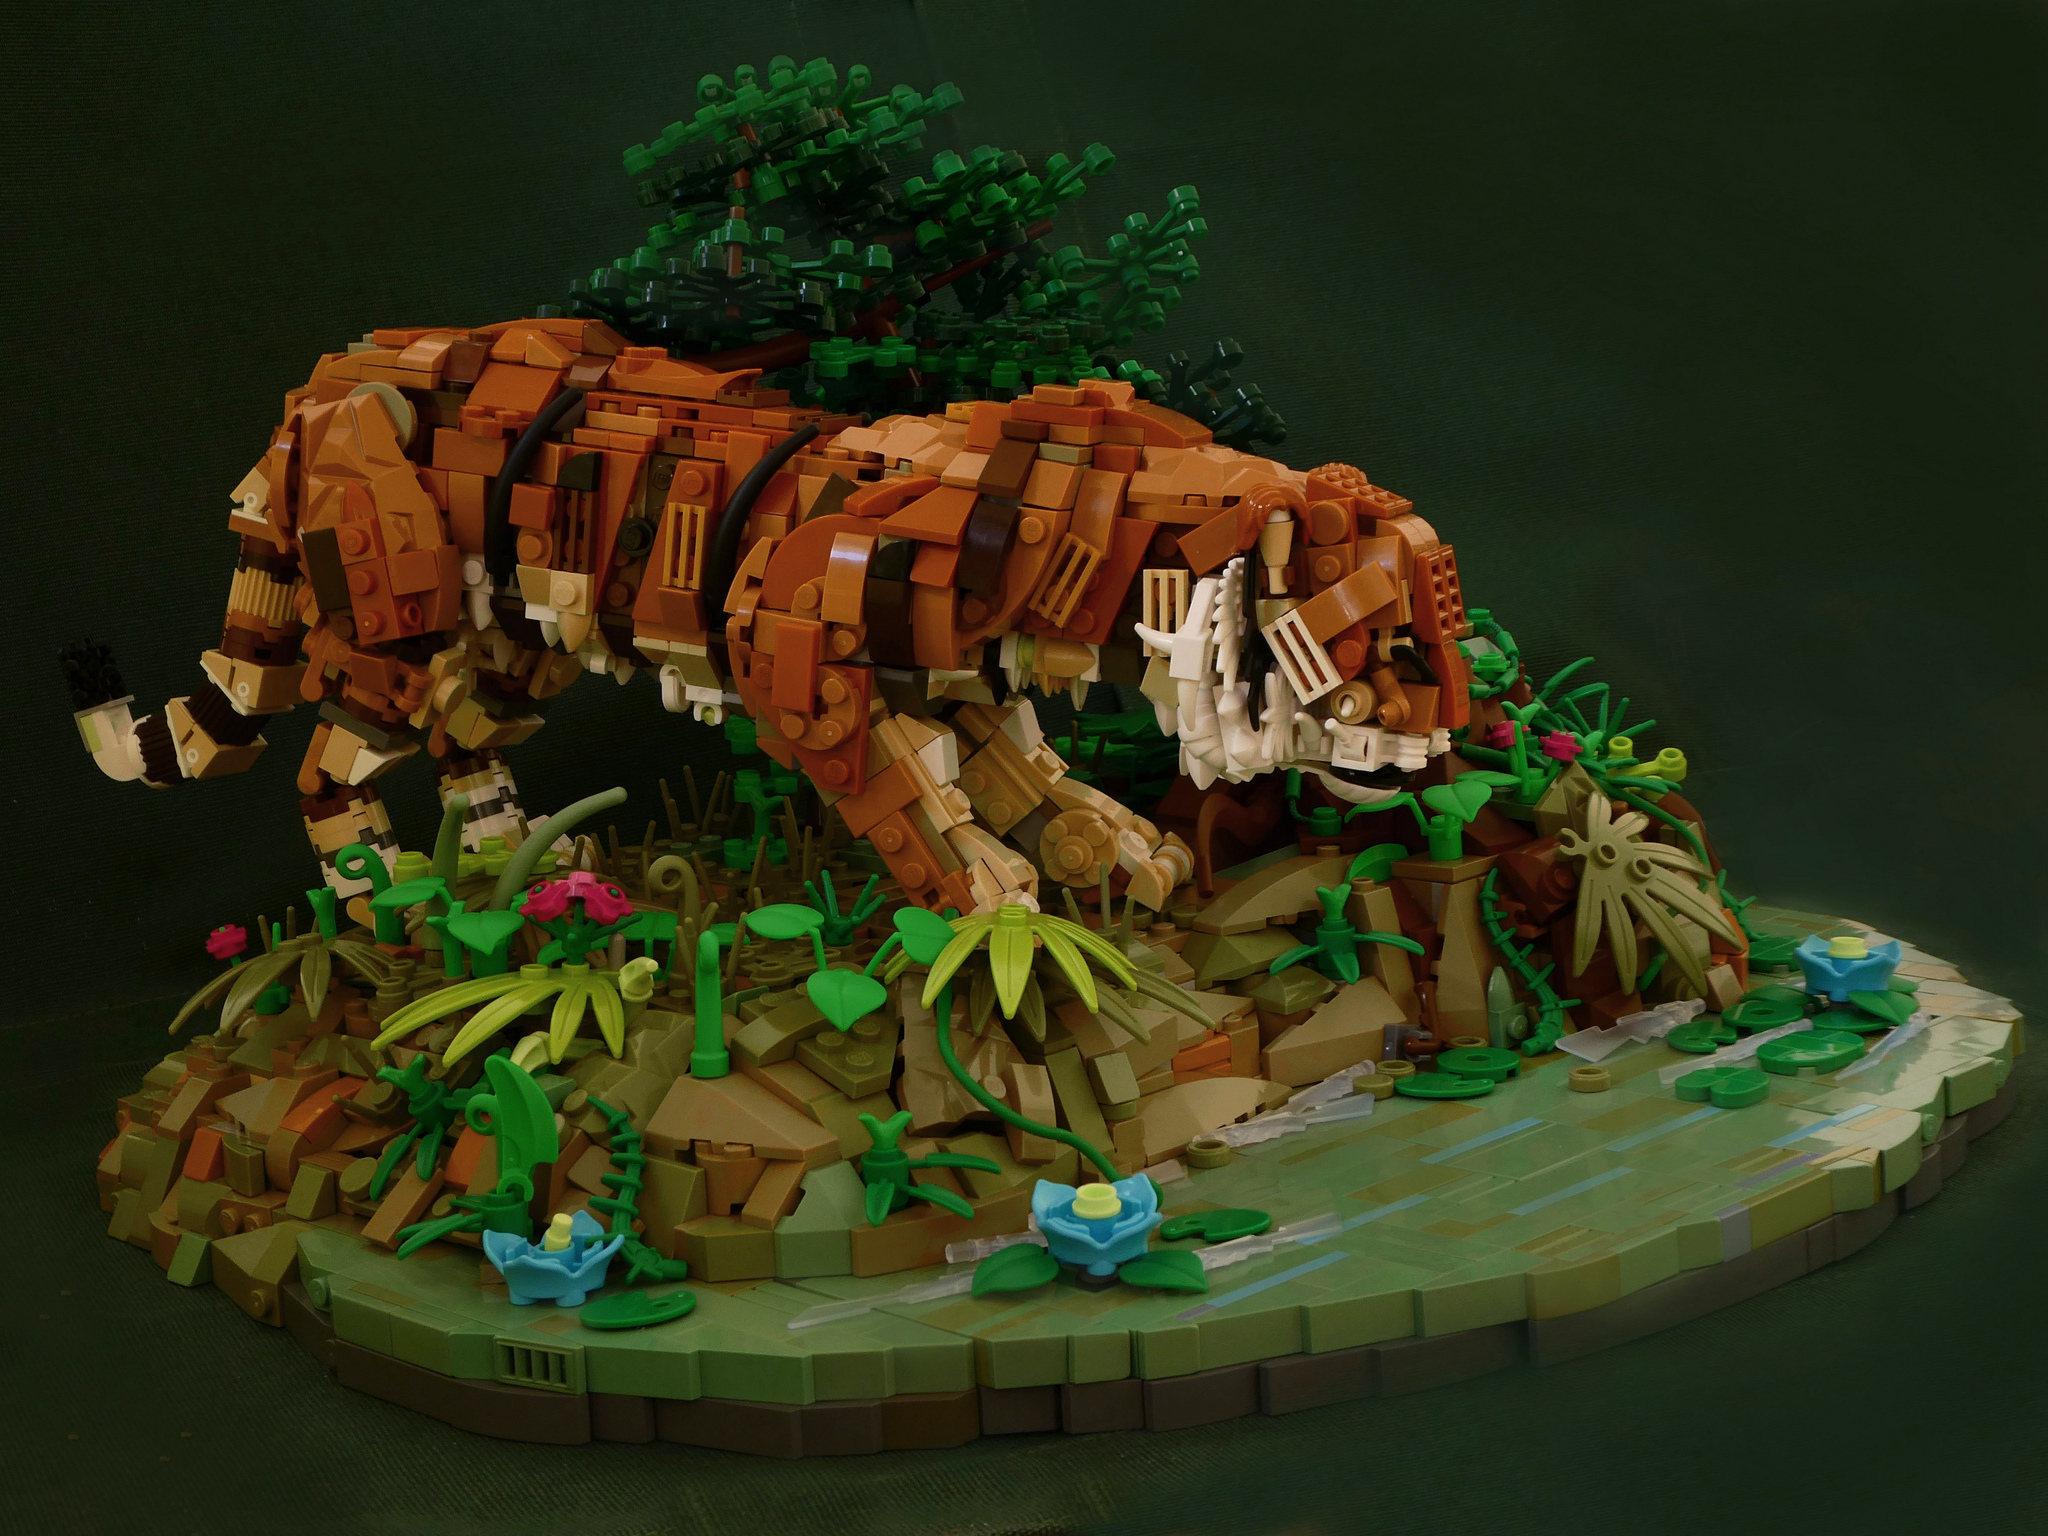 LEGO Tijger MOC Simon NH - Veel Bouwplezier